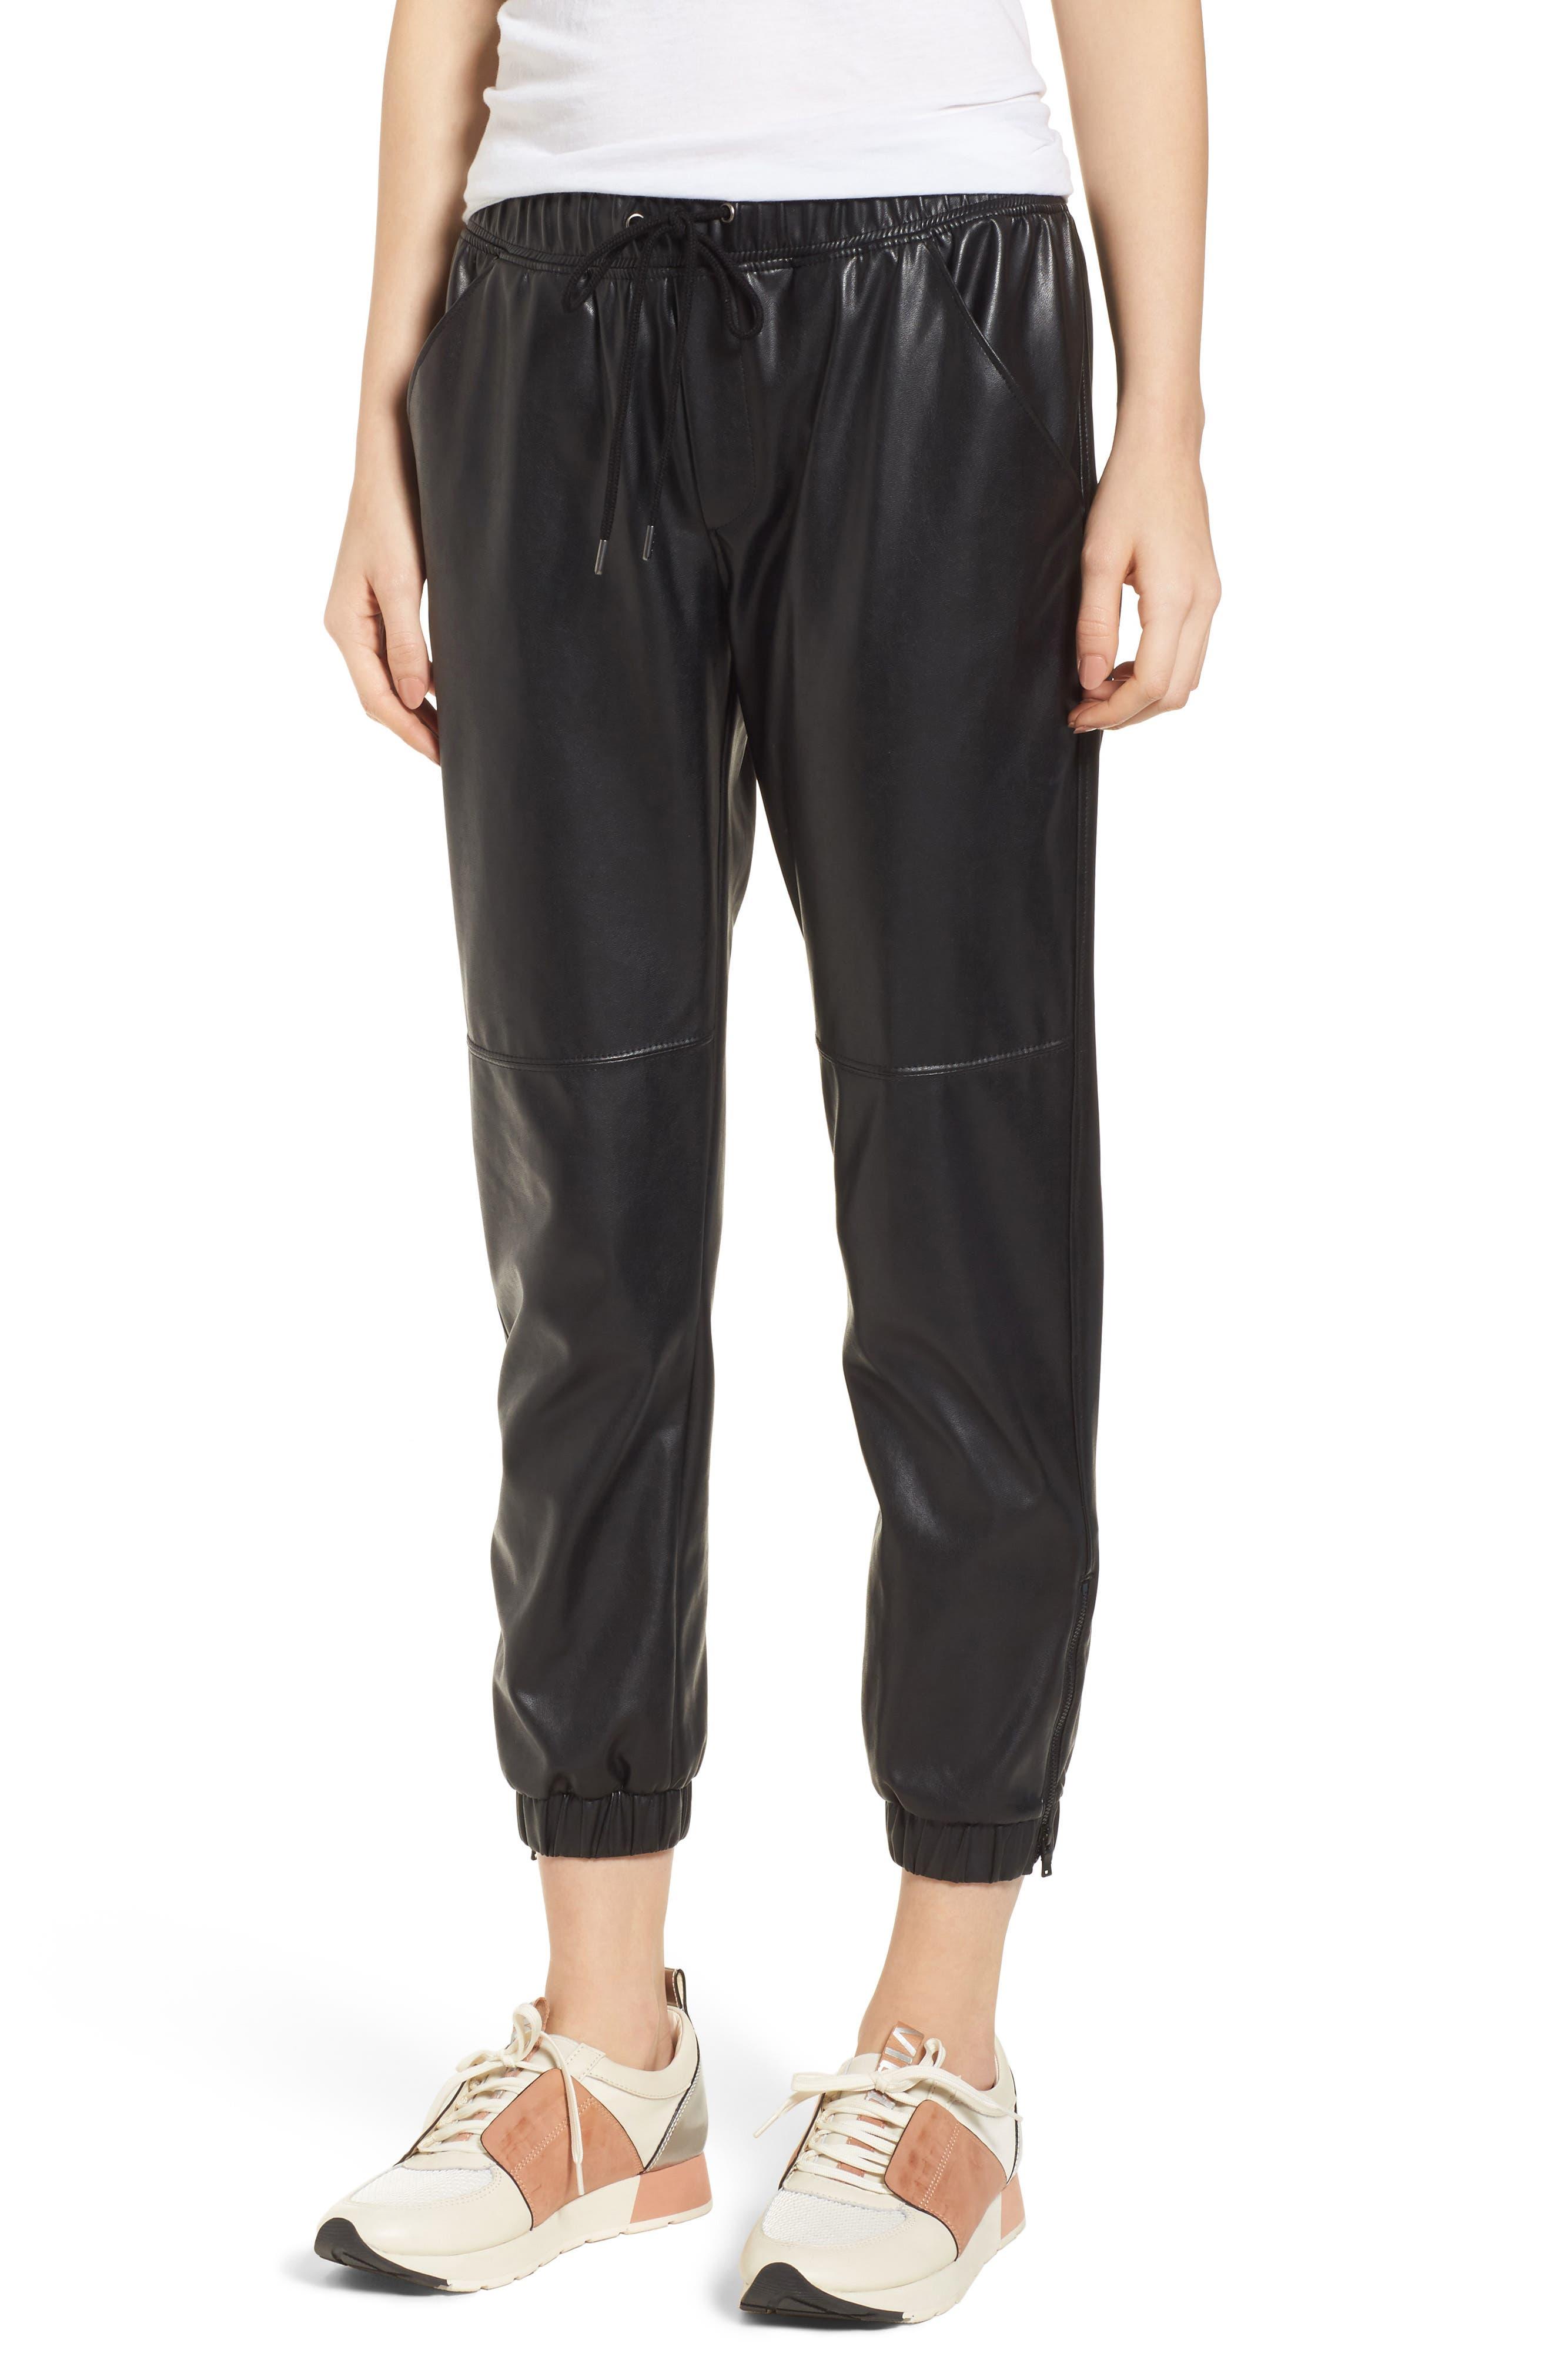 Ankle Zip Jogger Pants,                             Main thumbnail 1, color,                             Black